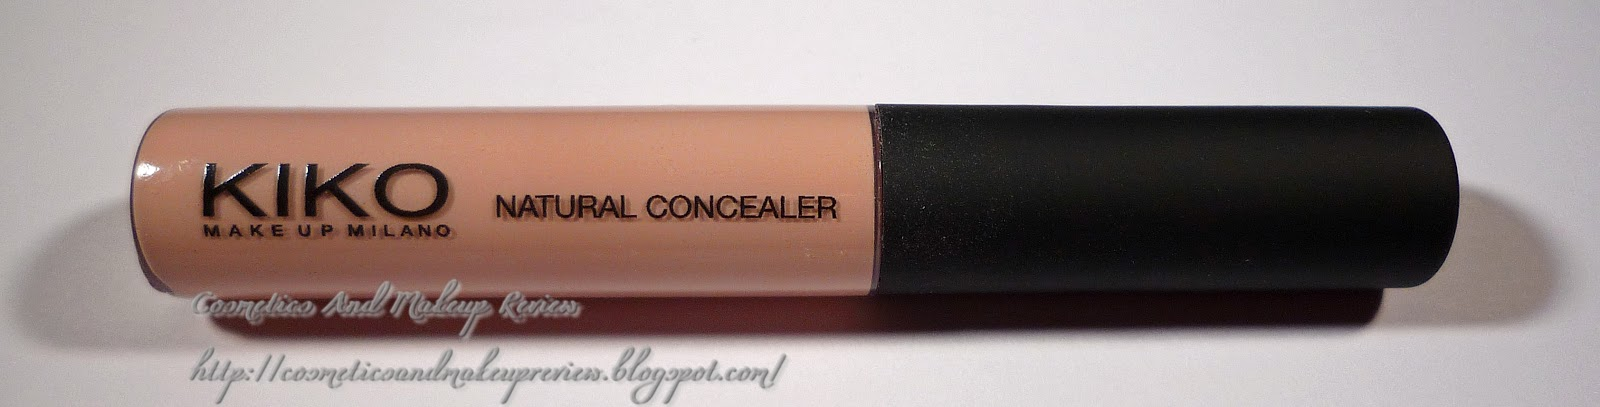 KIKO - Natural Concealer - 01 chiaro - tubetto